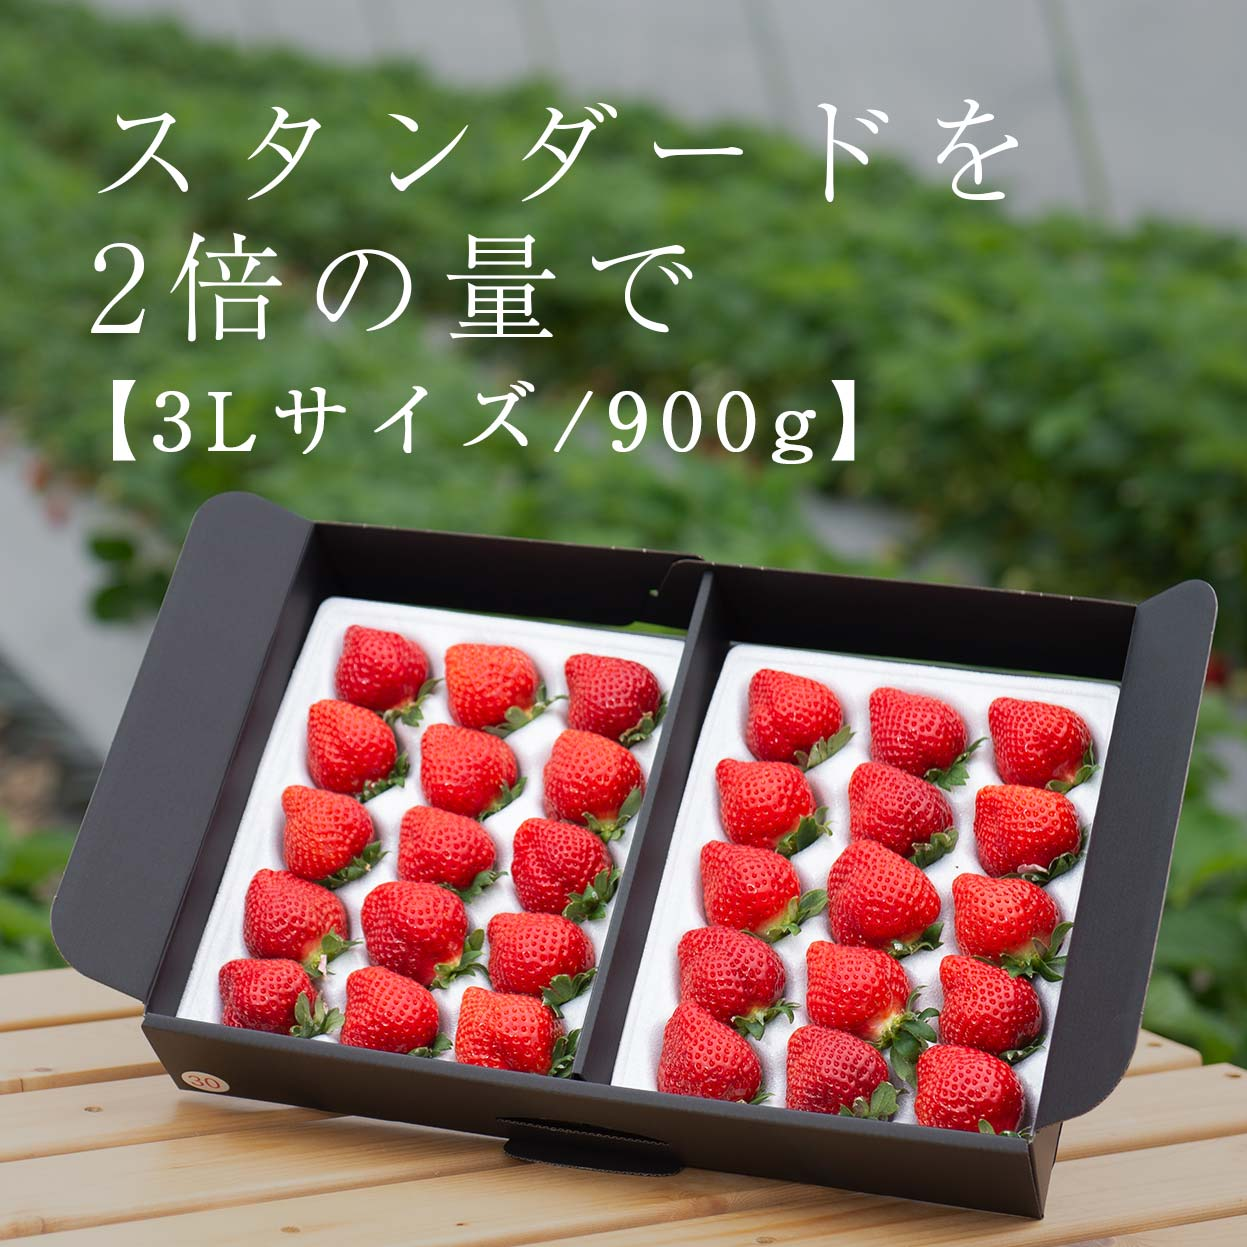 生果3L/900g